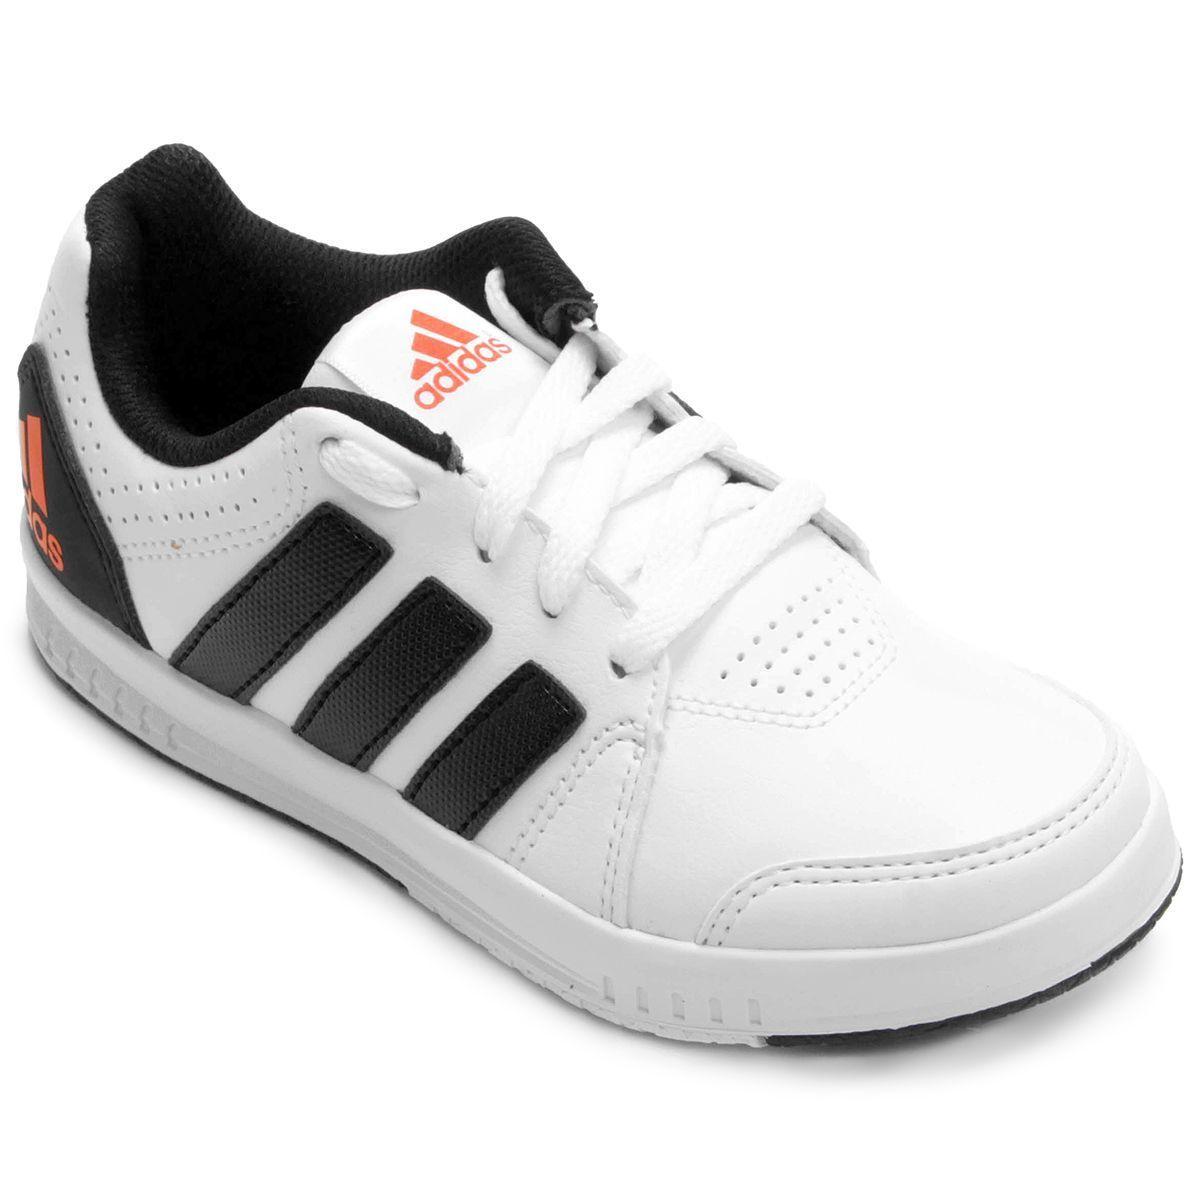 Tênis Adidas Lk Trainer 7 Synth Infantil / Branco - Preto